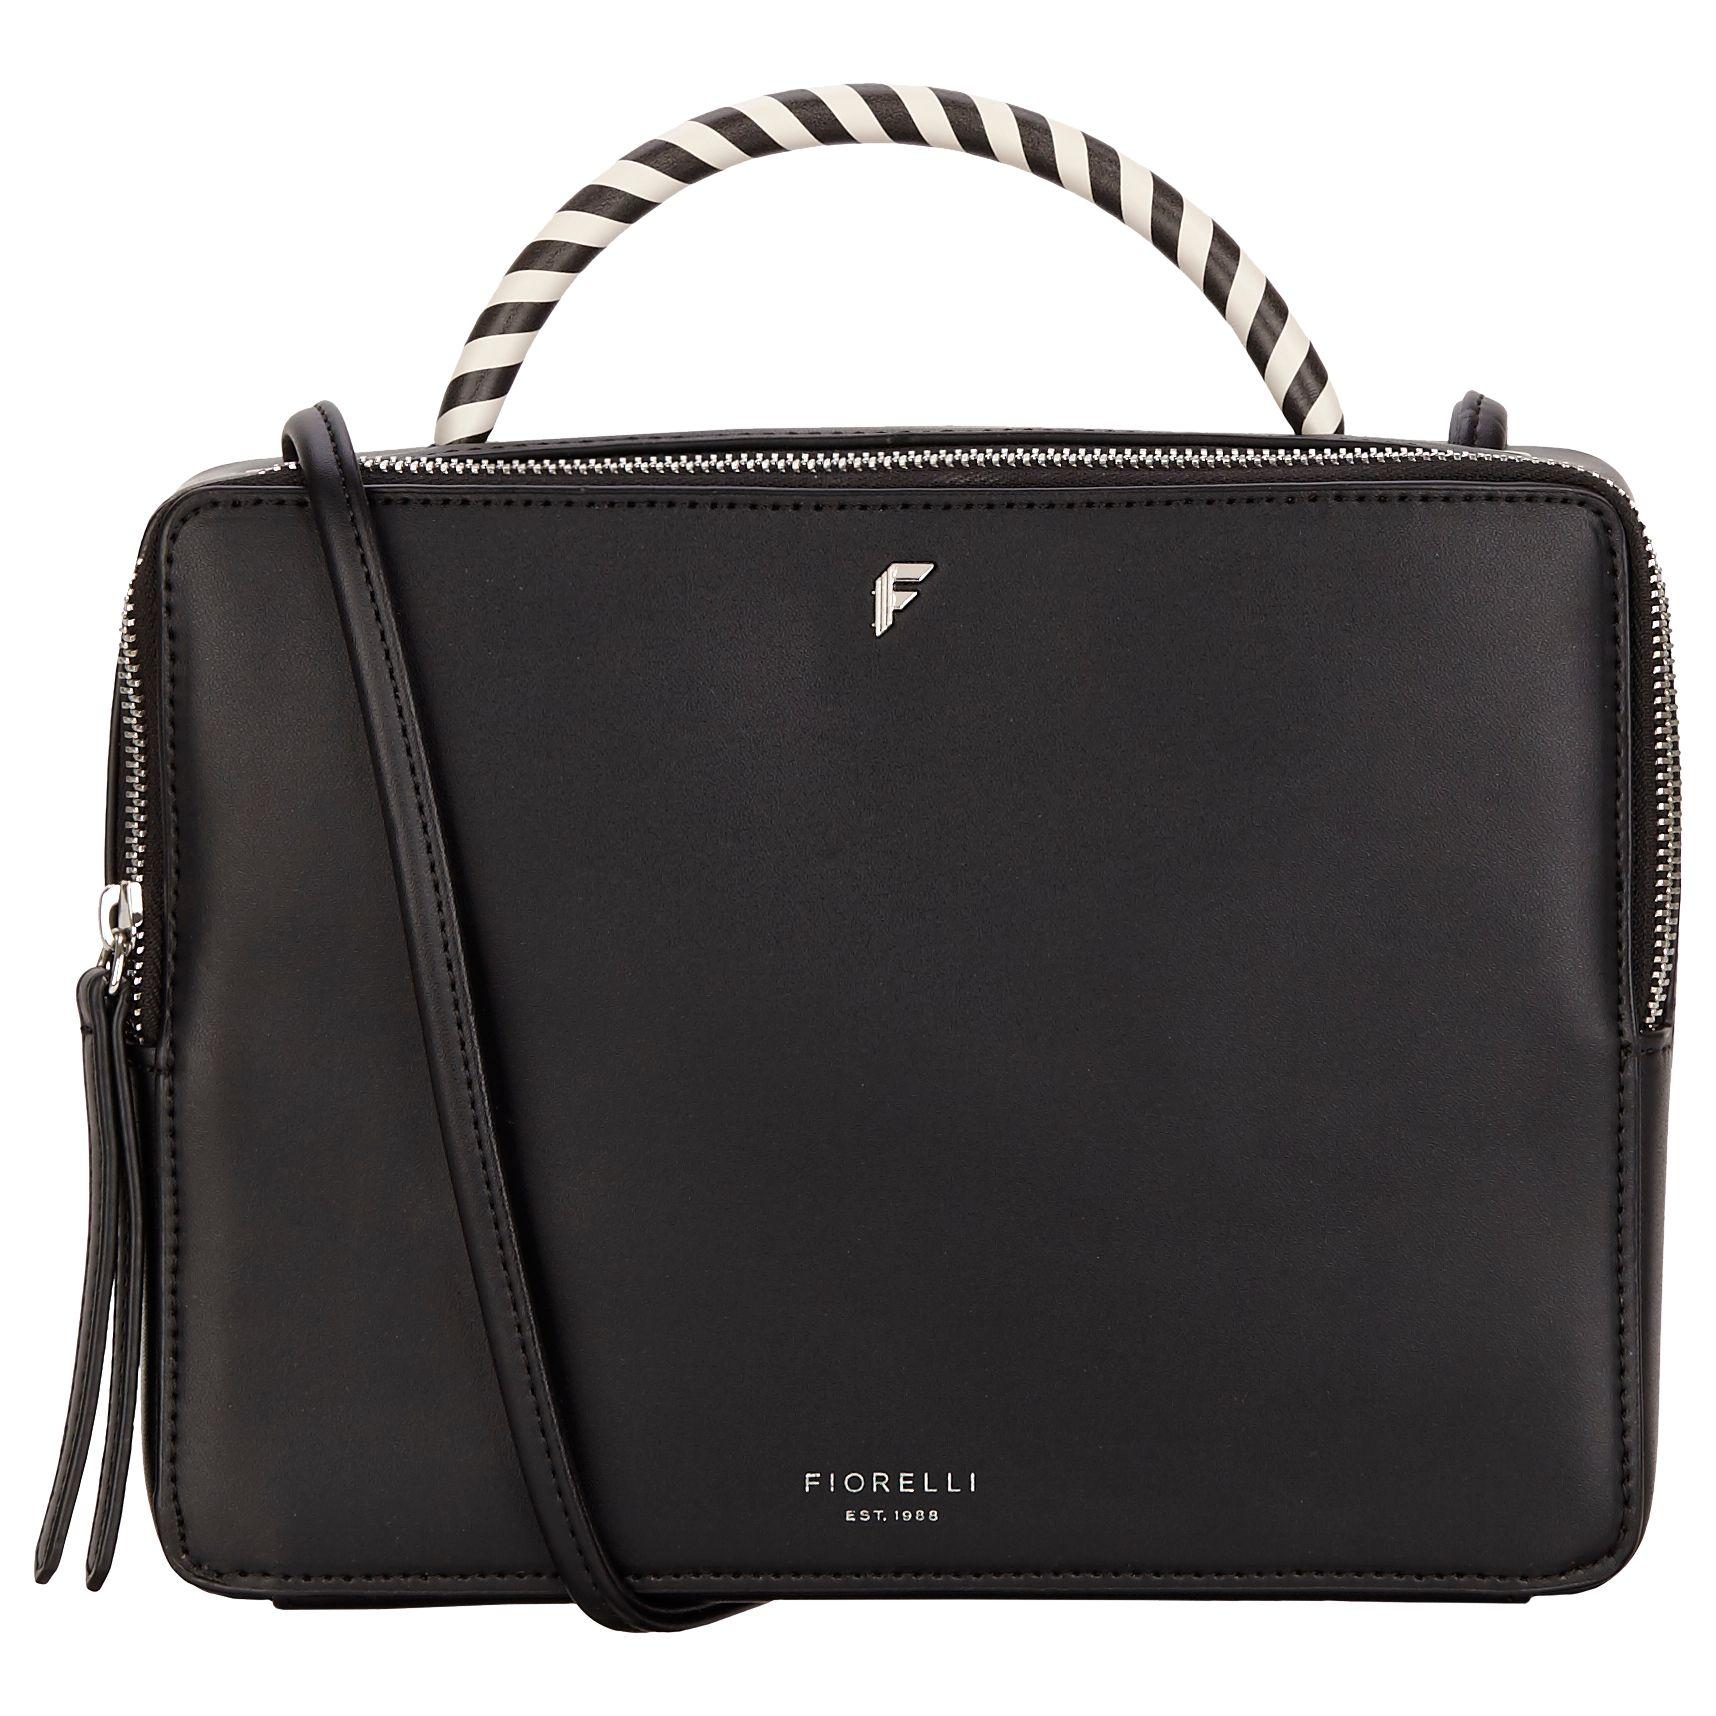 Fiorelli Fiorelli Rowan Boxy Across Body Bag